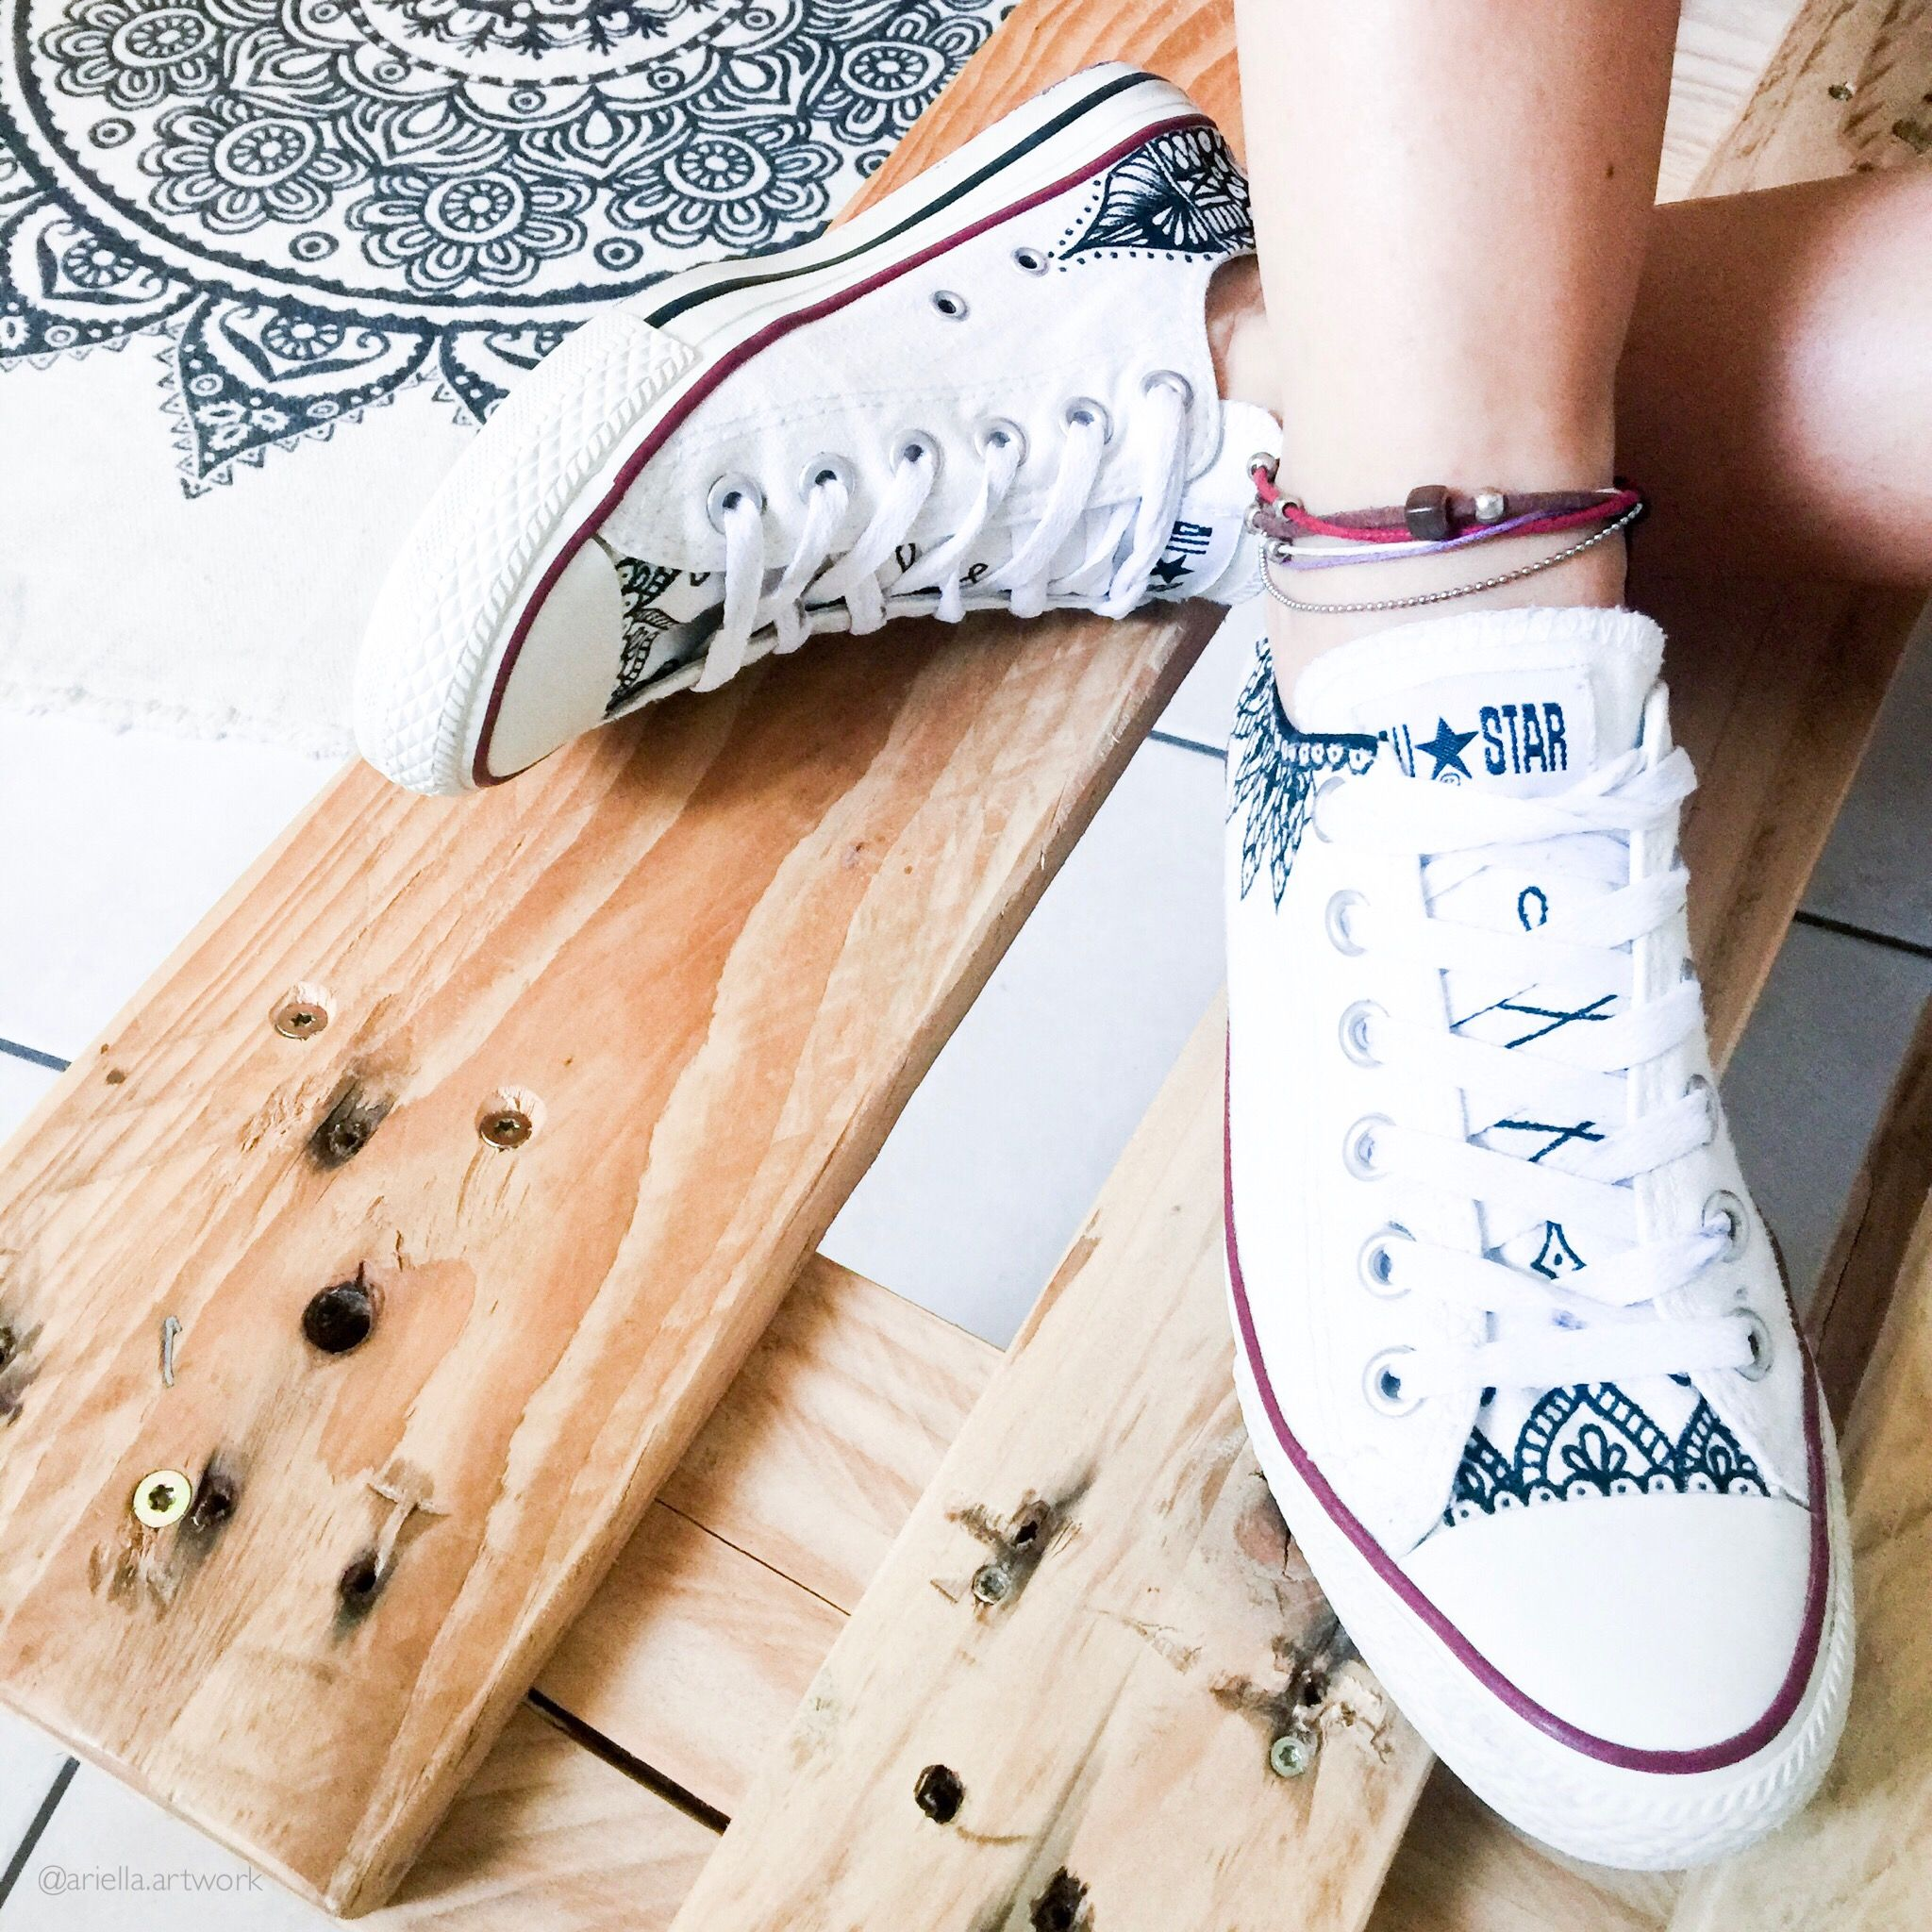 Diy Chucks Bemalen Handbemalte Schuhe Malerei Schuhe Designerschuhe